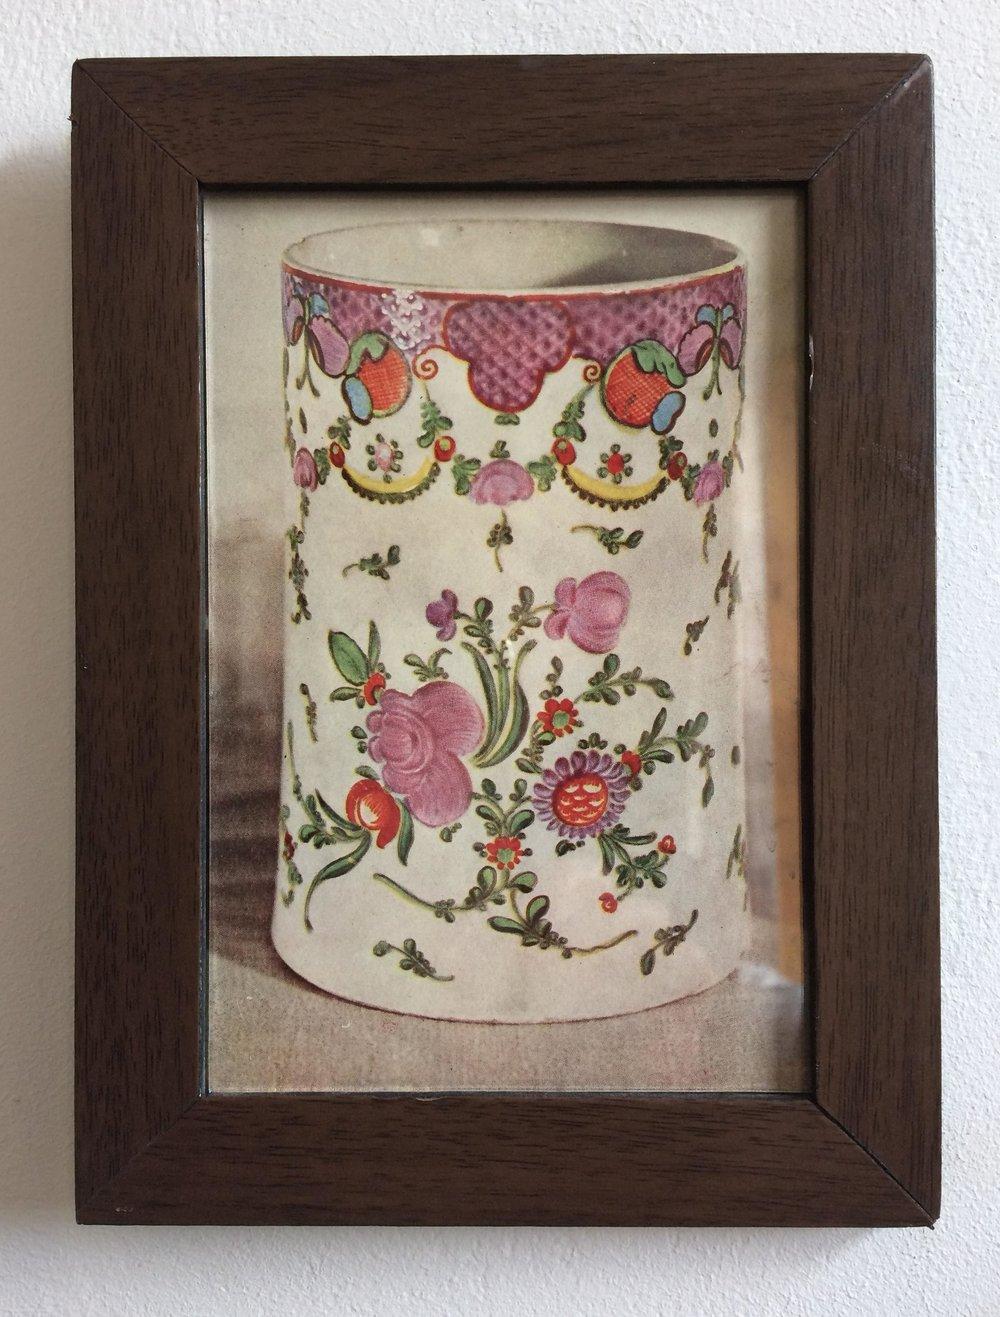 Staffordshire pottery vase - framed photograph .